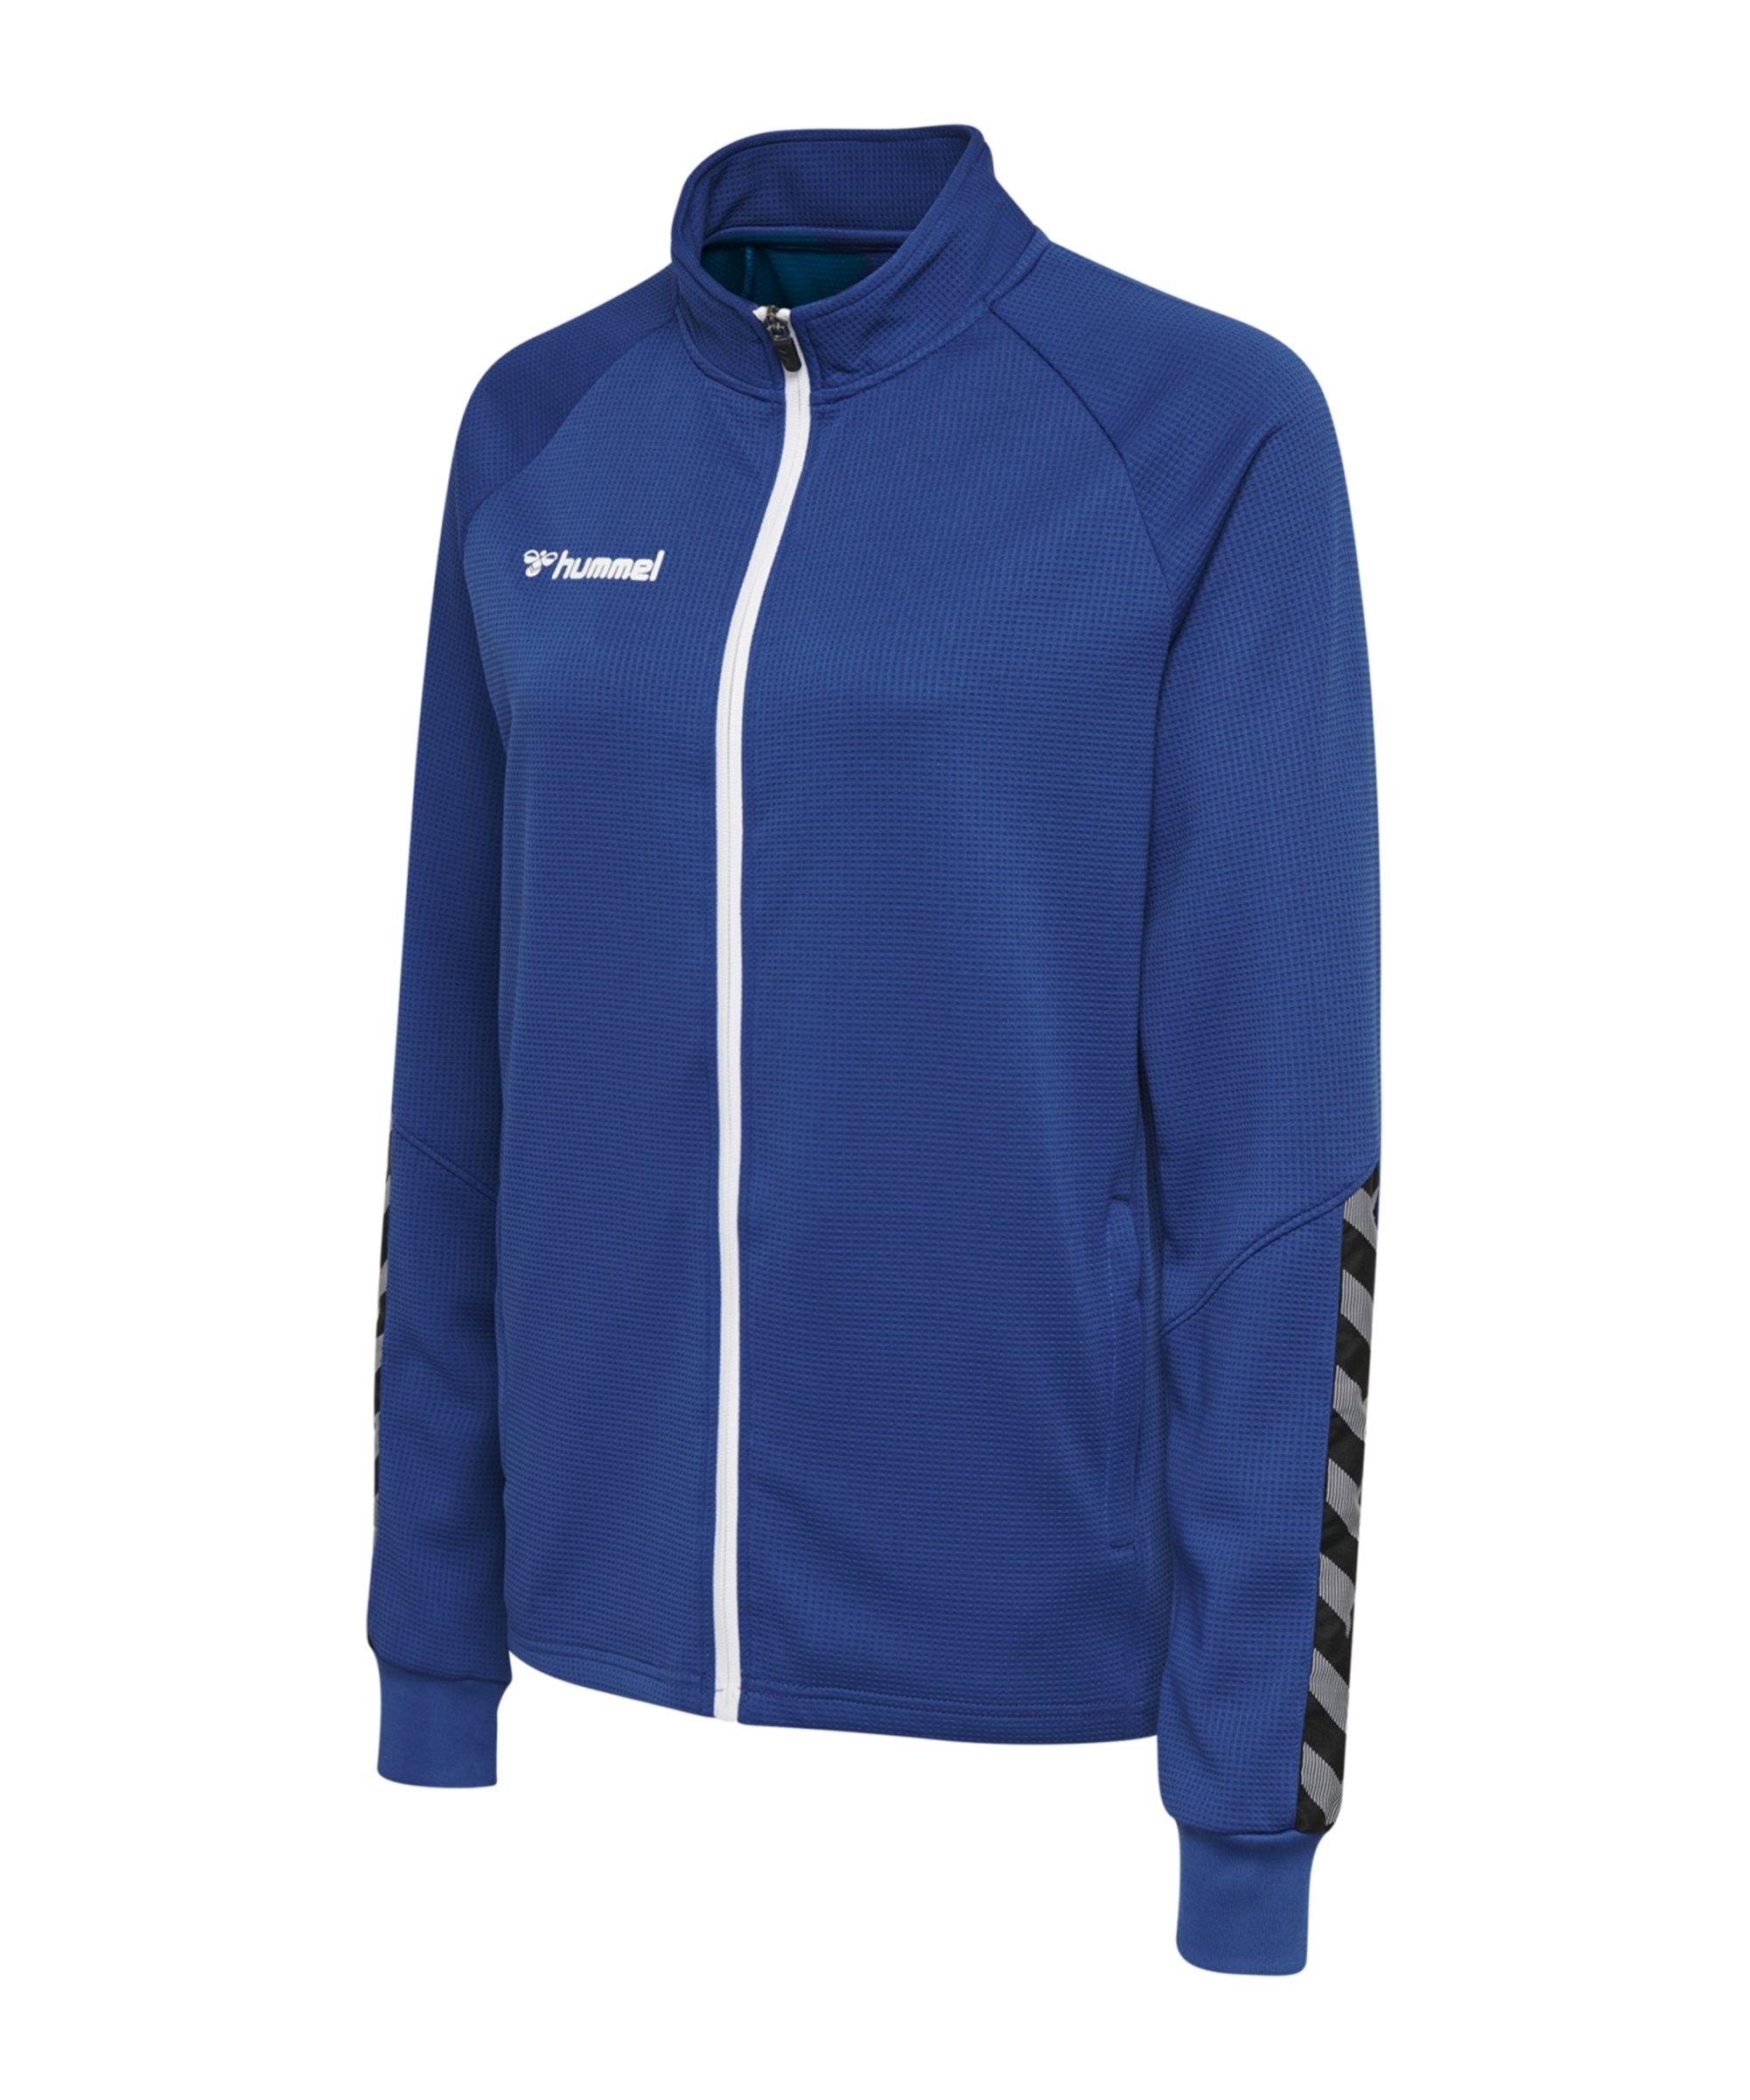 Hummel Authentic Poly Trainingsjacke Damen F7045 - blau